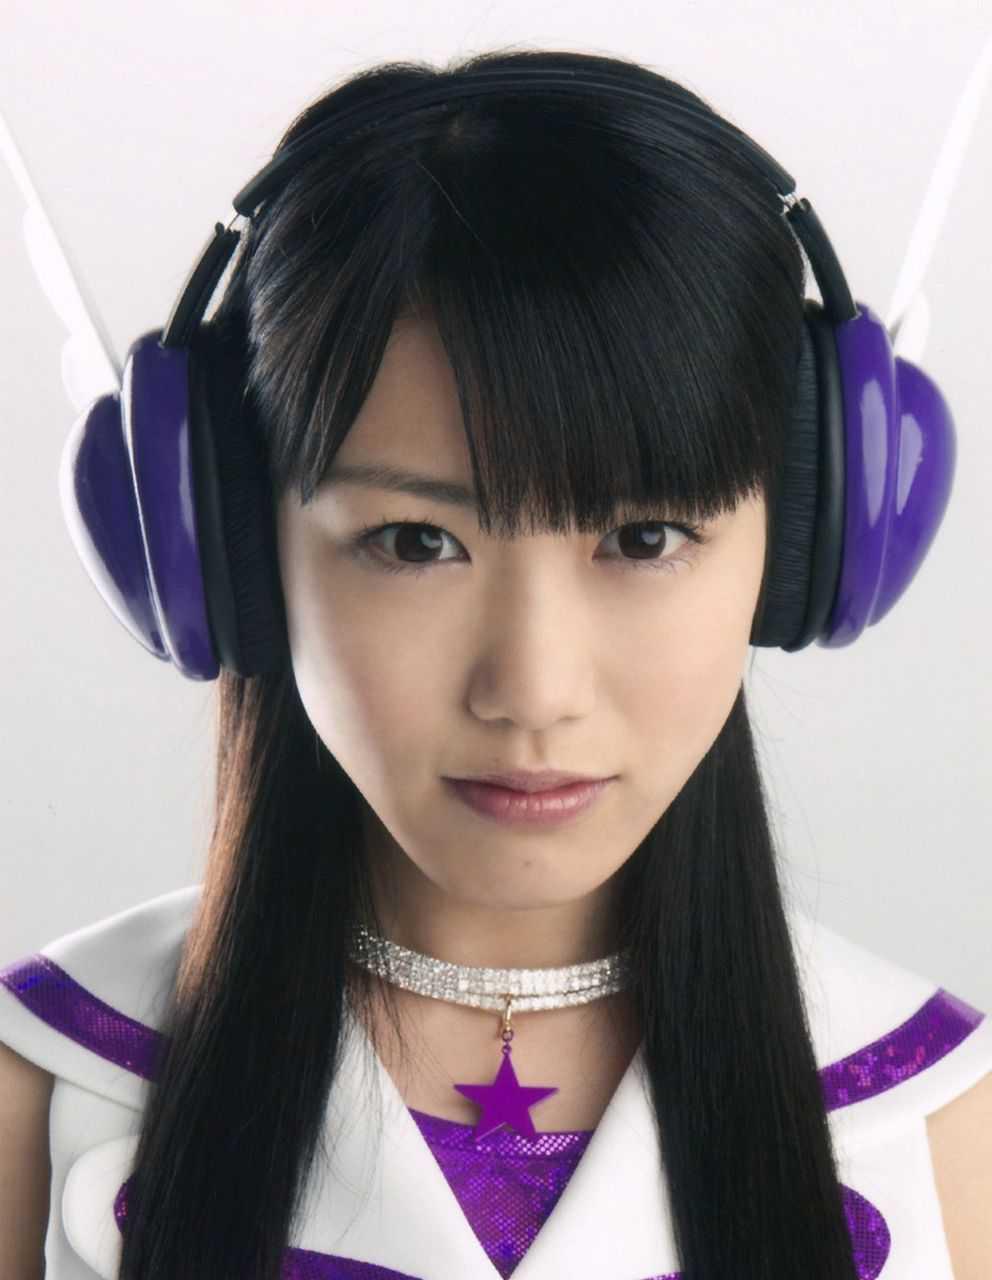 Takagi Reni (Momoiro Clover)